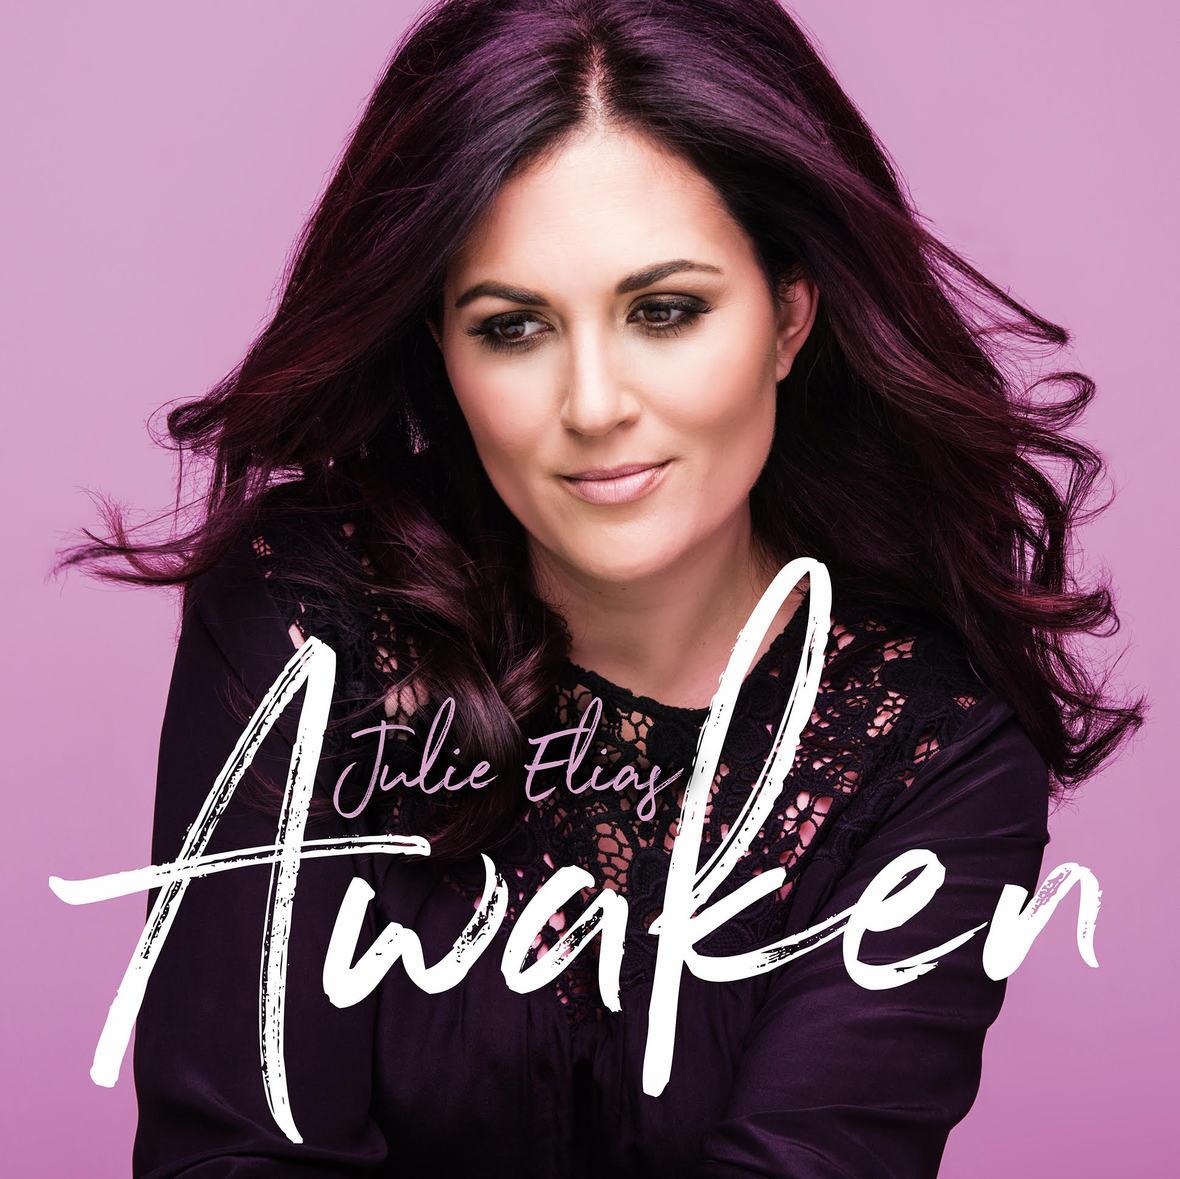 Julie Elias - Awaken - Cover Art